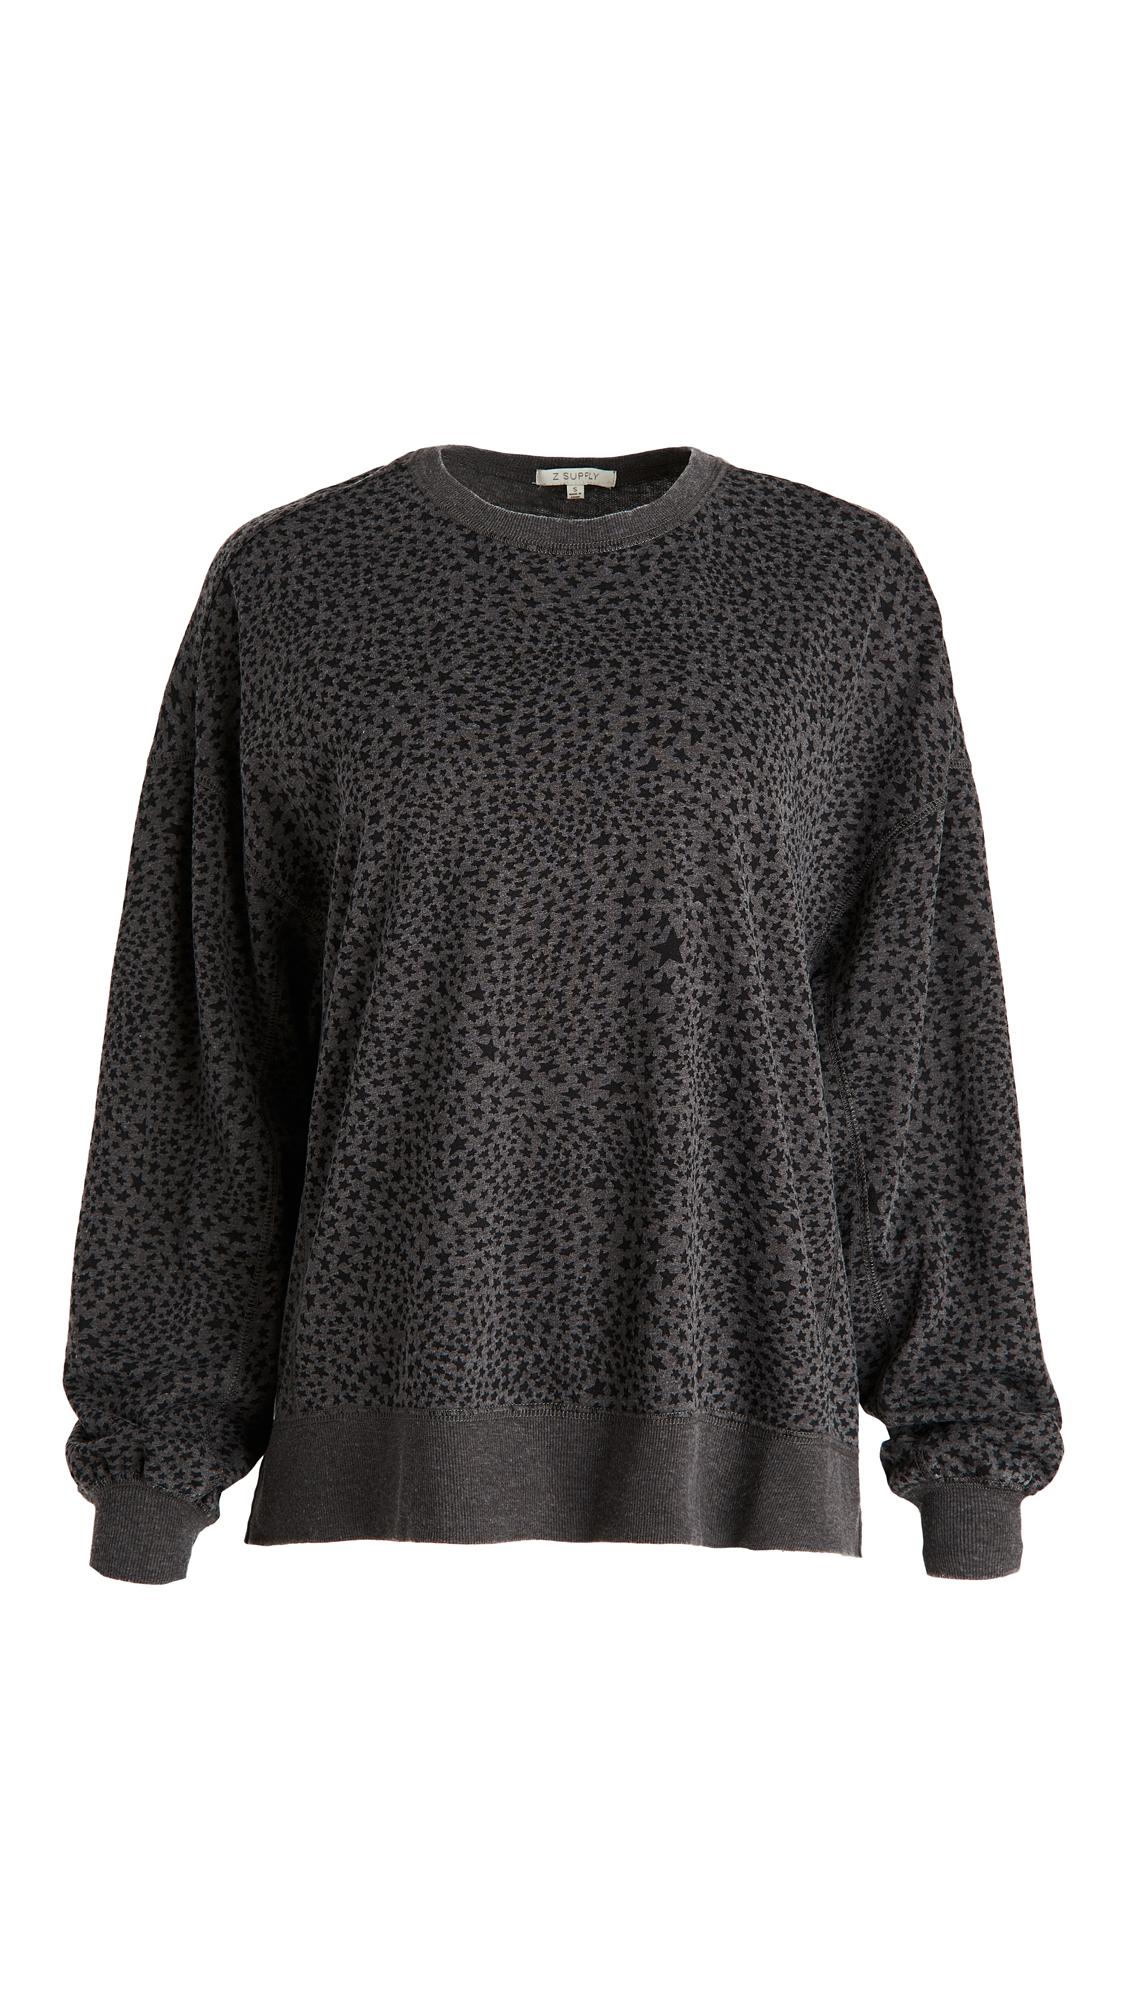 Z Supply Stardust Modern Weekender Sweatshirt